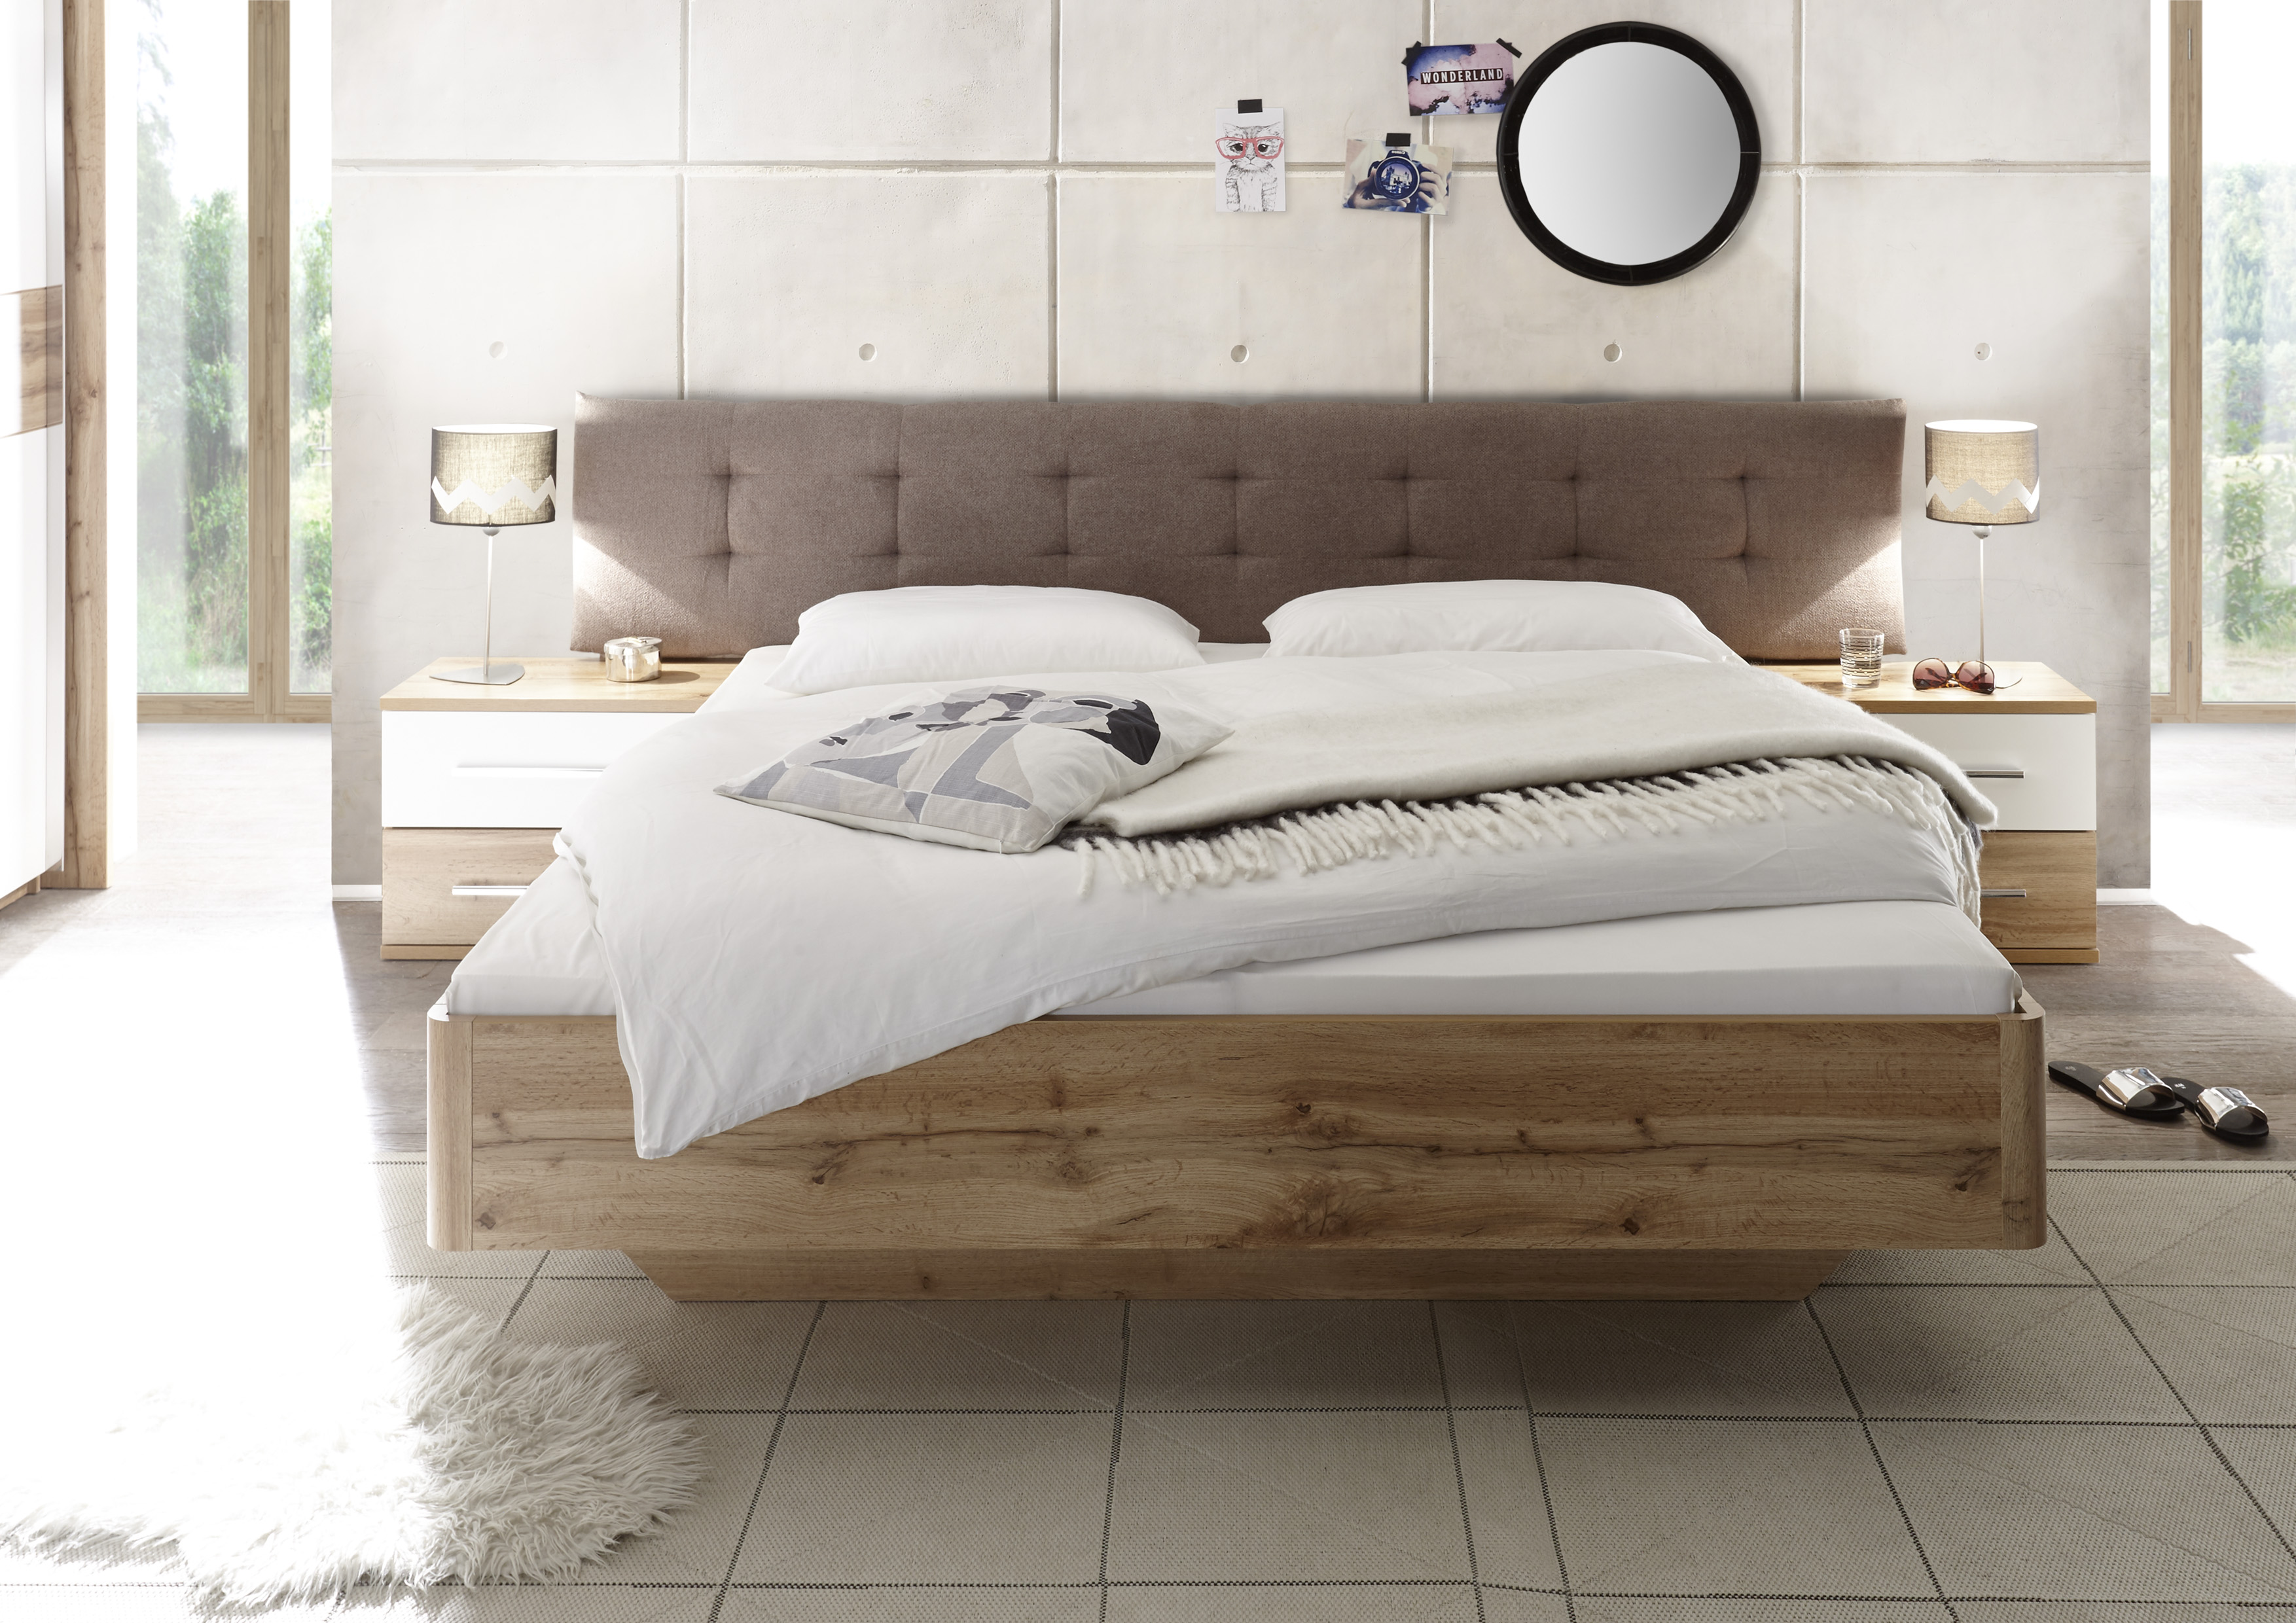 Schlafzimmer Komplett Set 5 Tlg Bergamo Bett 180: Schlafzimmer Komplett Set 4-tlg. BERGAMO Bett 180